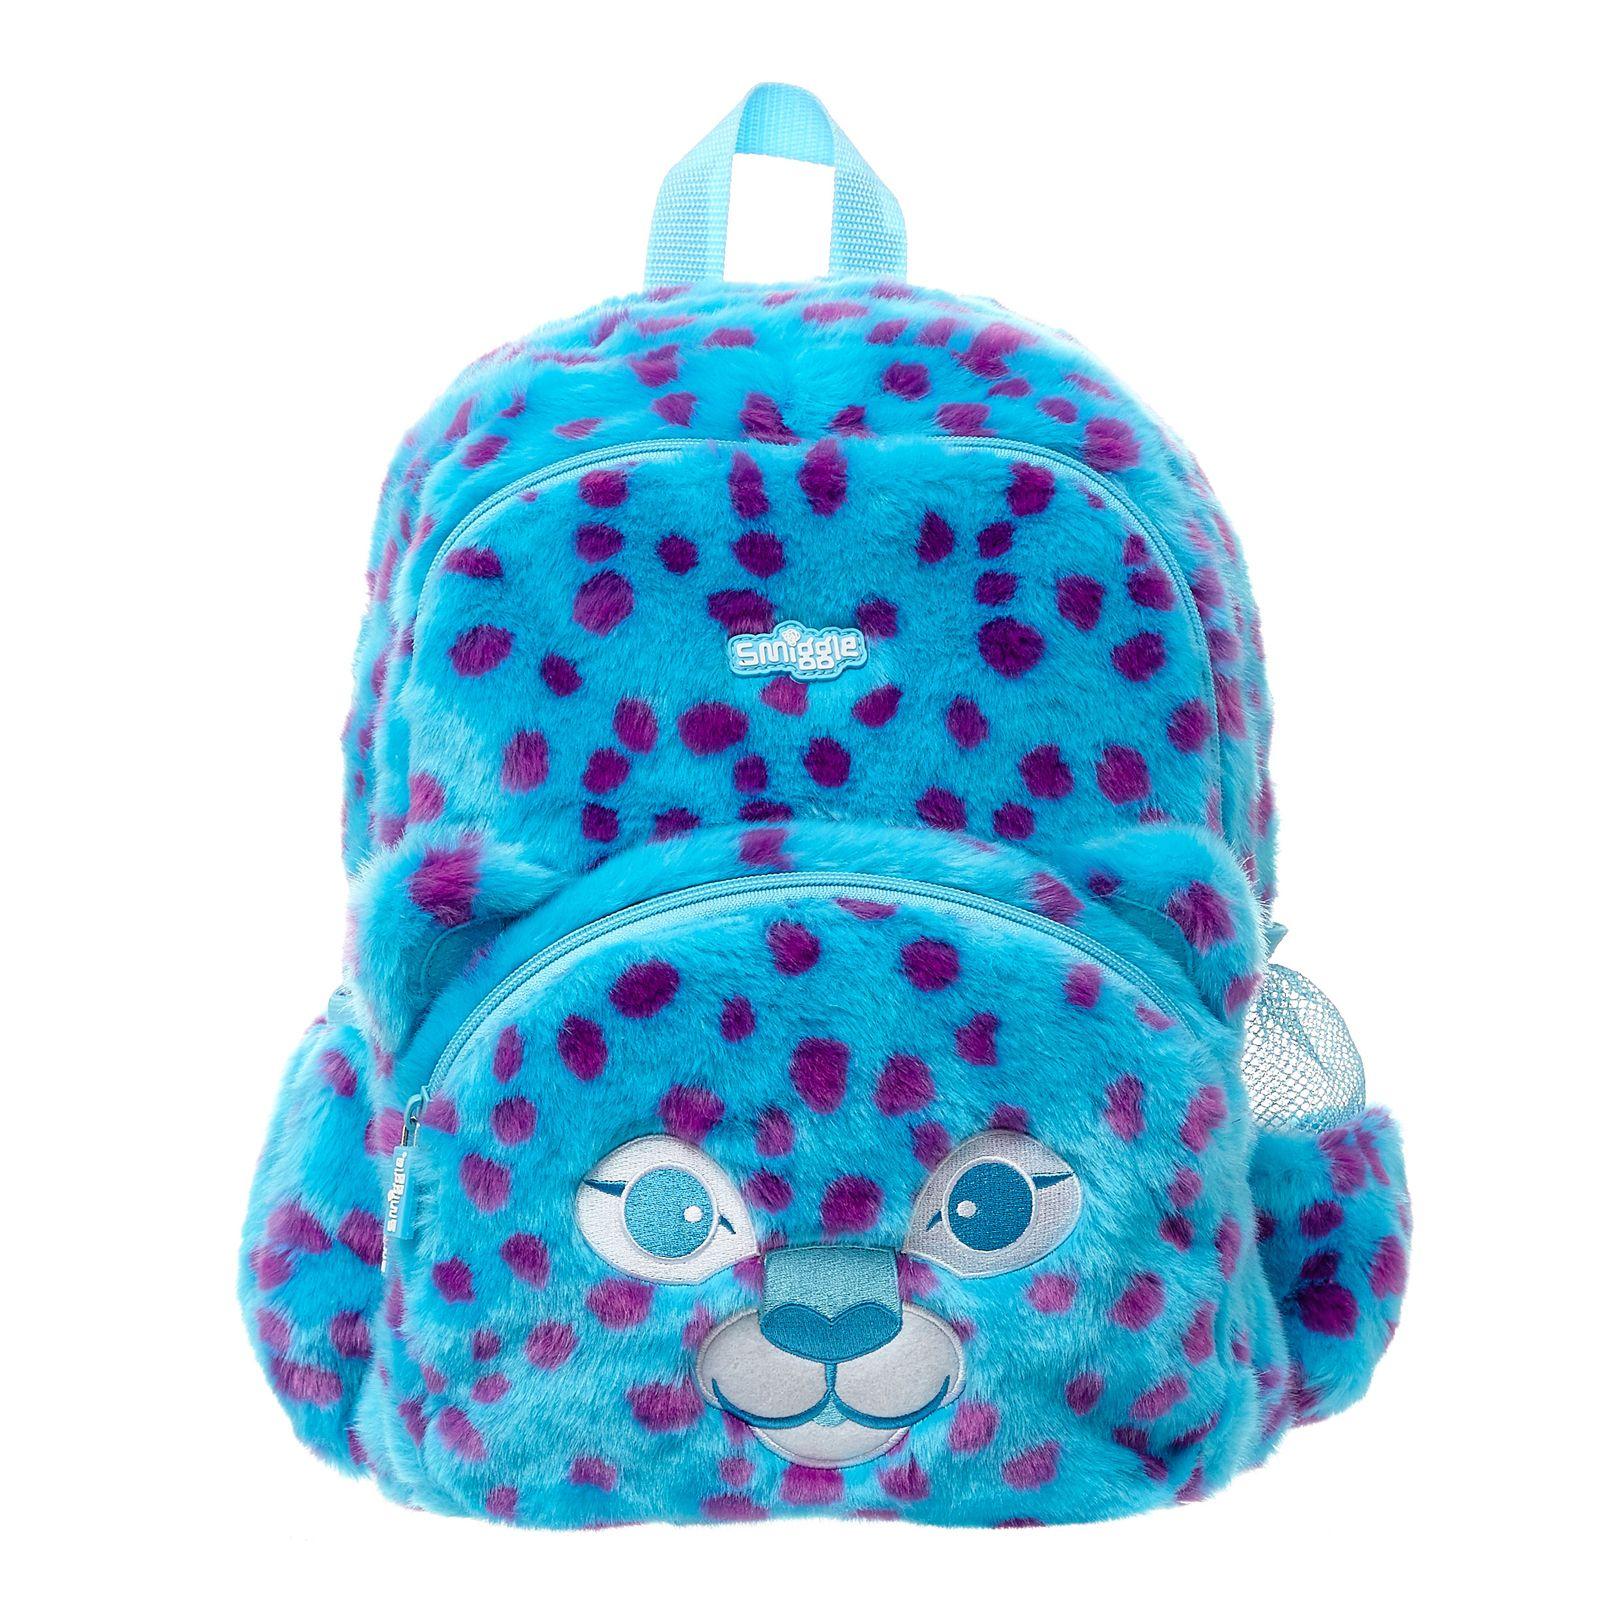 Smiggle bags for school - Smiggle Unique Backpackskids Bagsschool